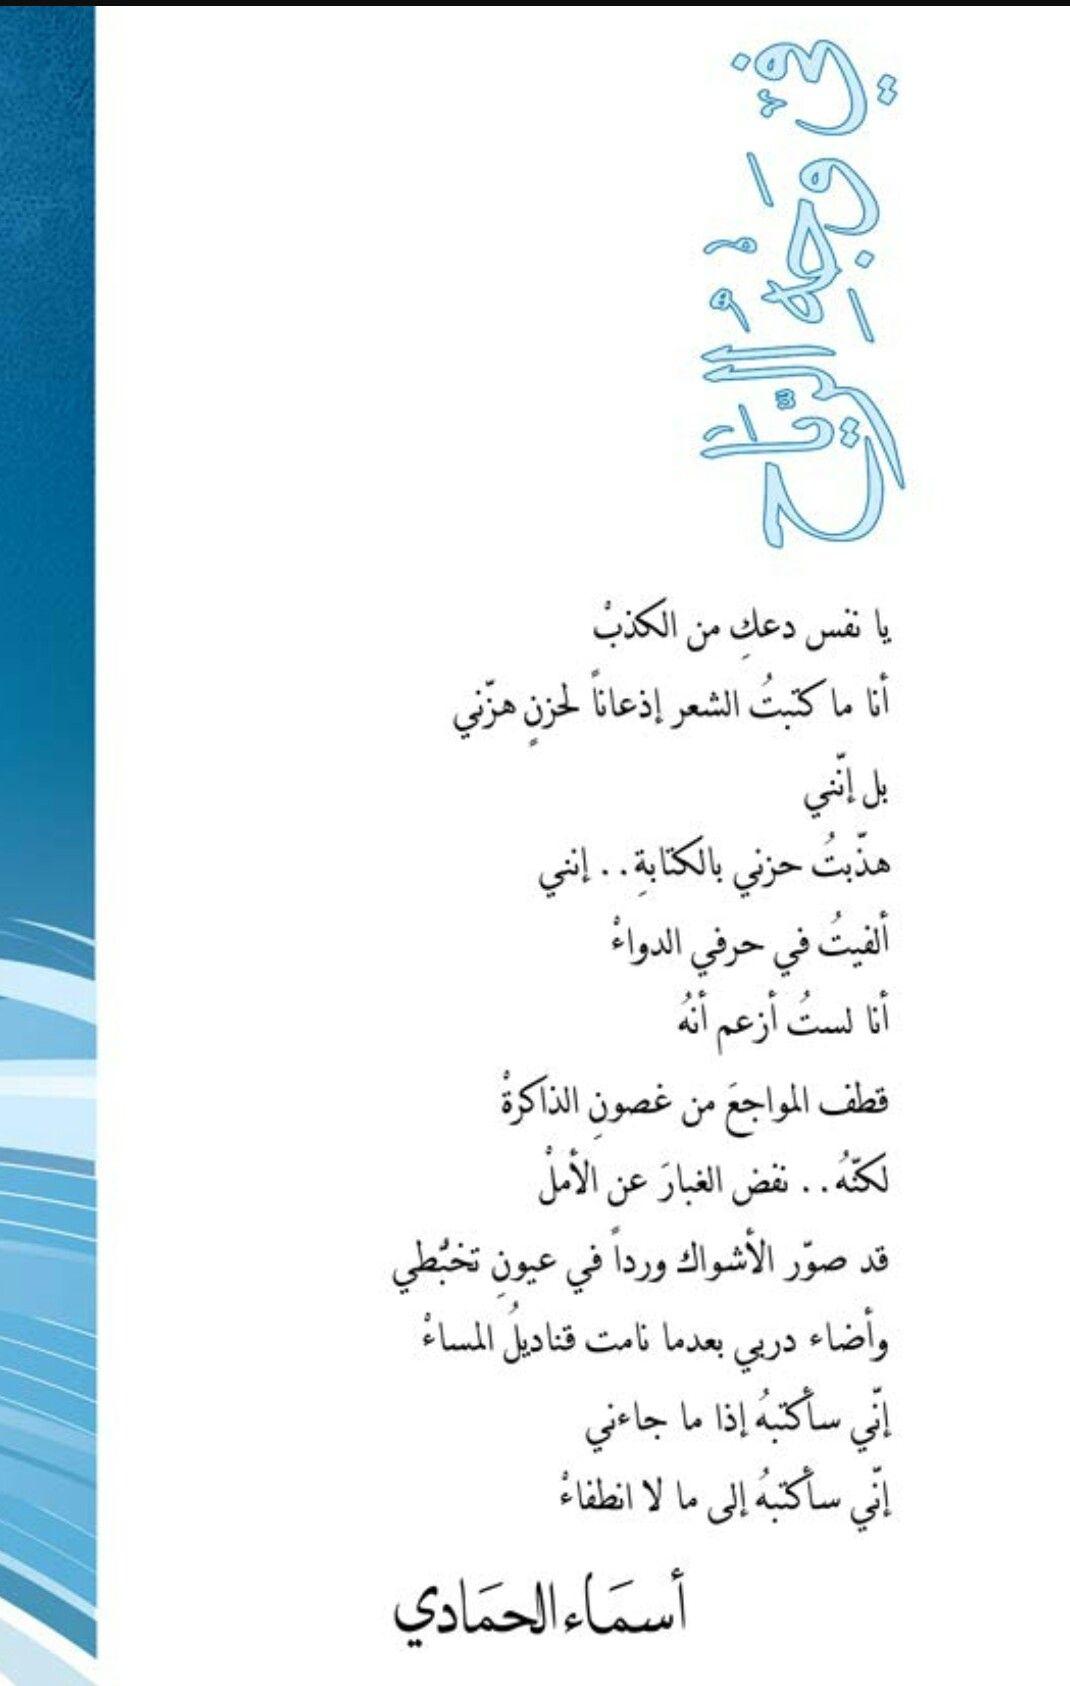 Pin By Inas Gadalla On غ ر ب ة ر وح Math Math Equations